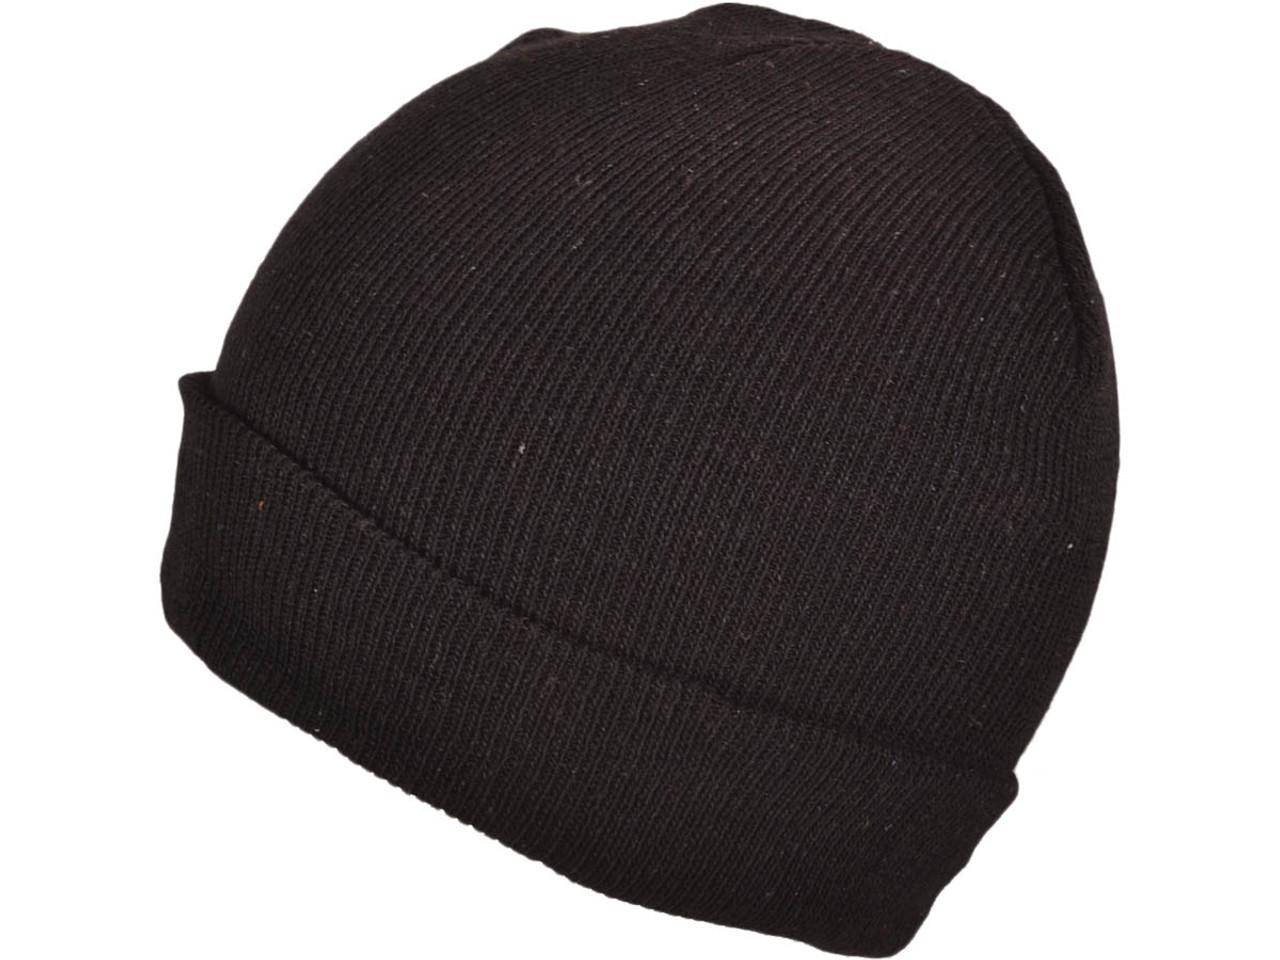 34bfbda51 *Dozen Pack* Winter Plain/Blank Beanies Wholesale Knit Hat Skull Toboggan  Stocking Caps (Black **Snug Fit**) - 4985